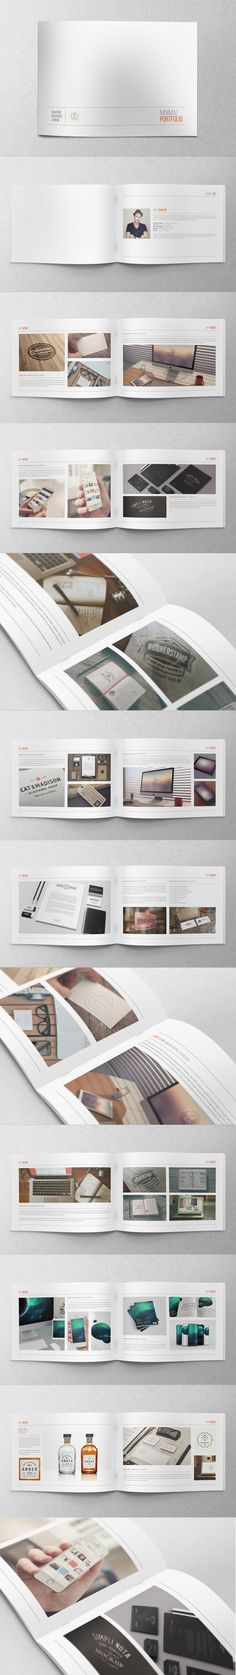 Minimal Hipster Design Portfolio on Behance